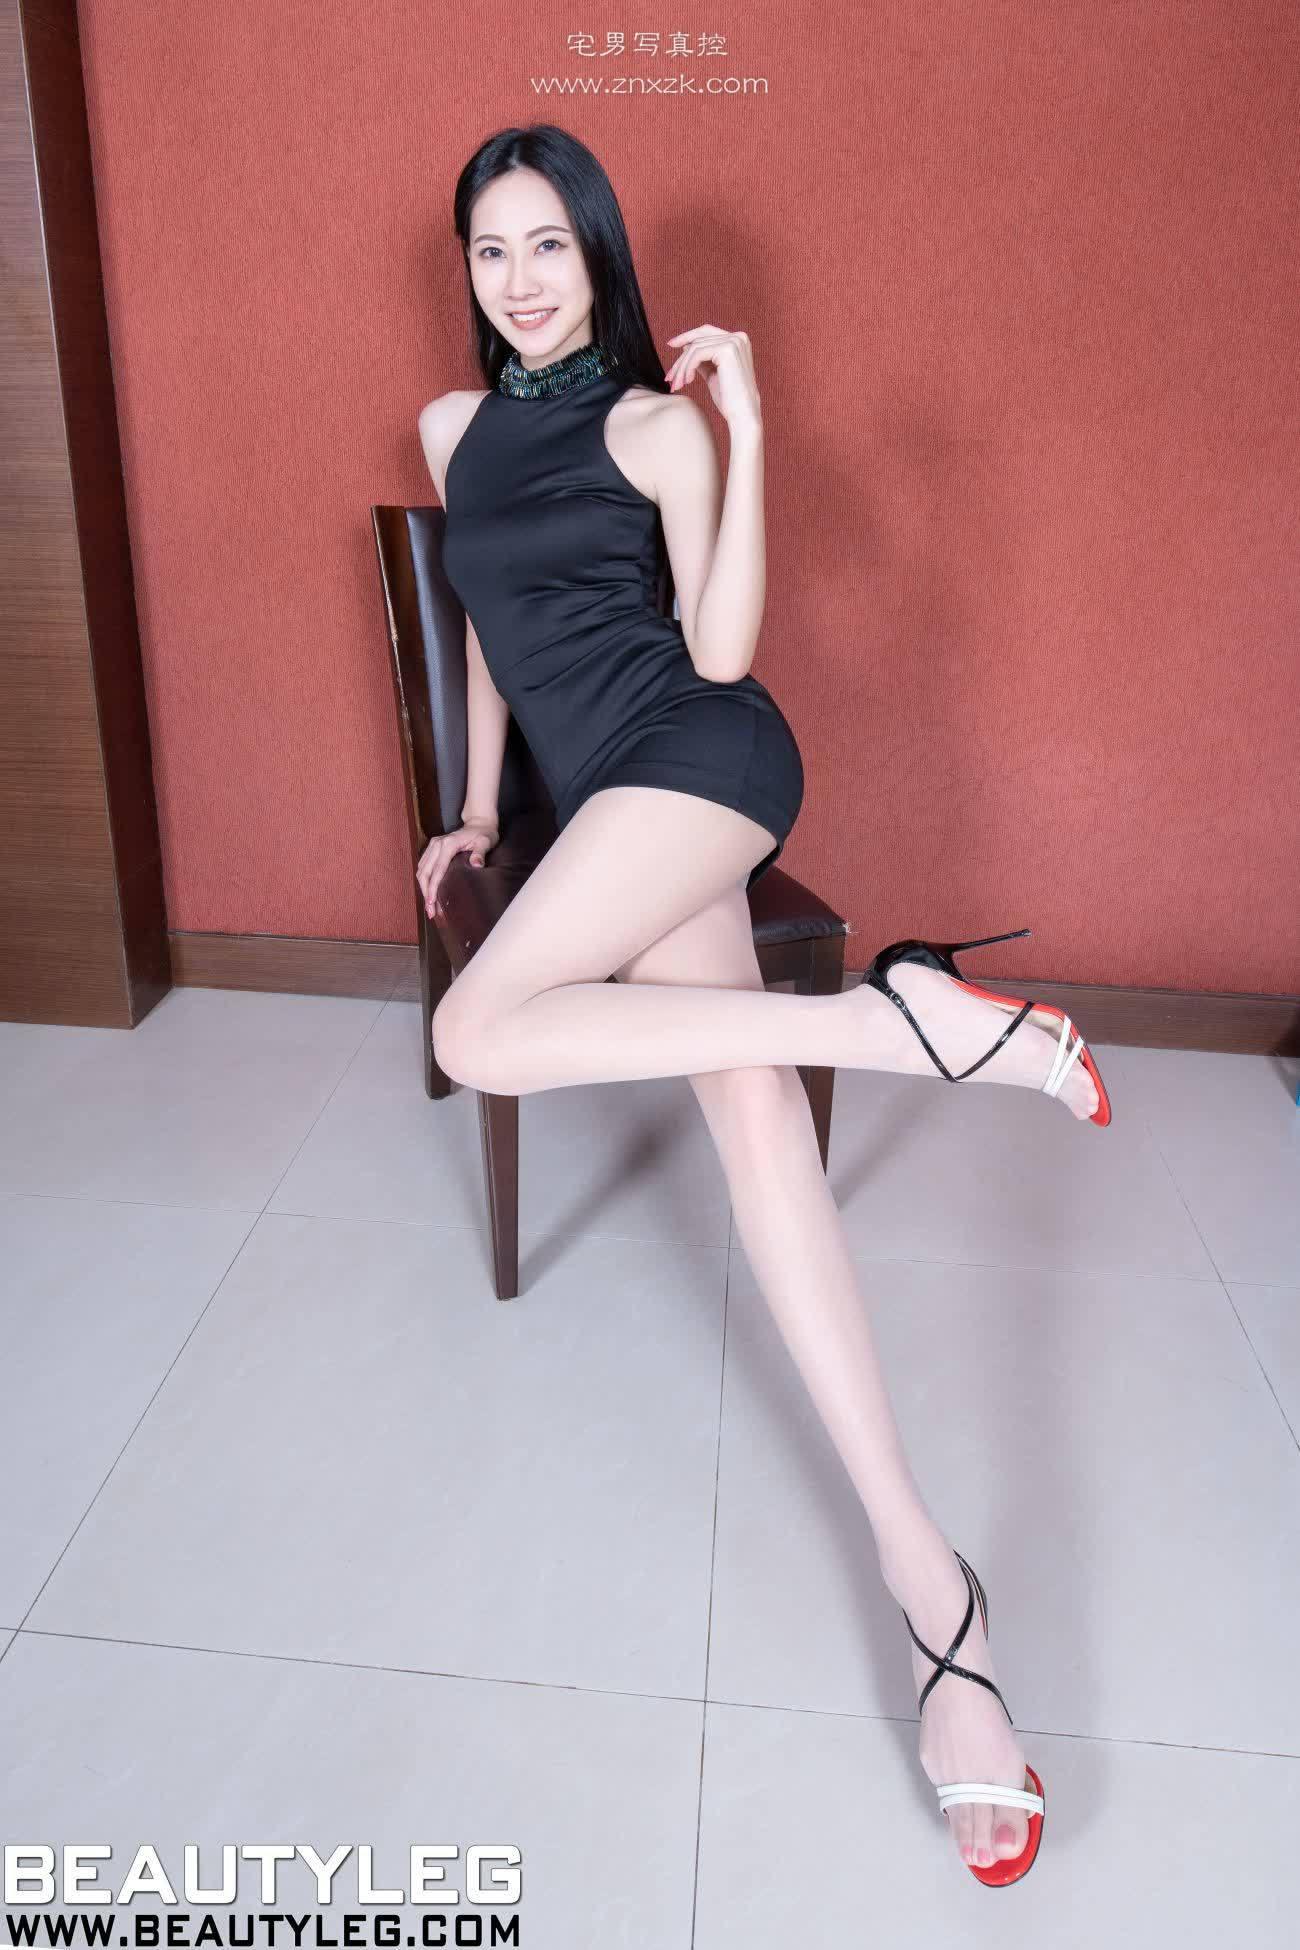 BEAUTYLEG台湾腿模写真 No.1676 Jing